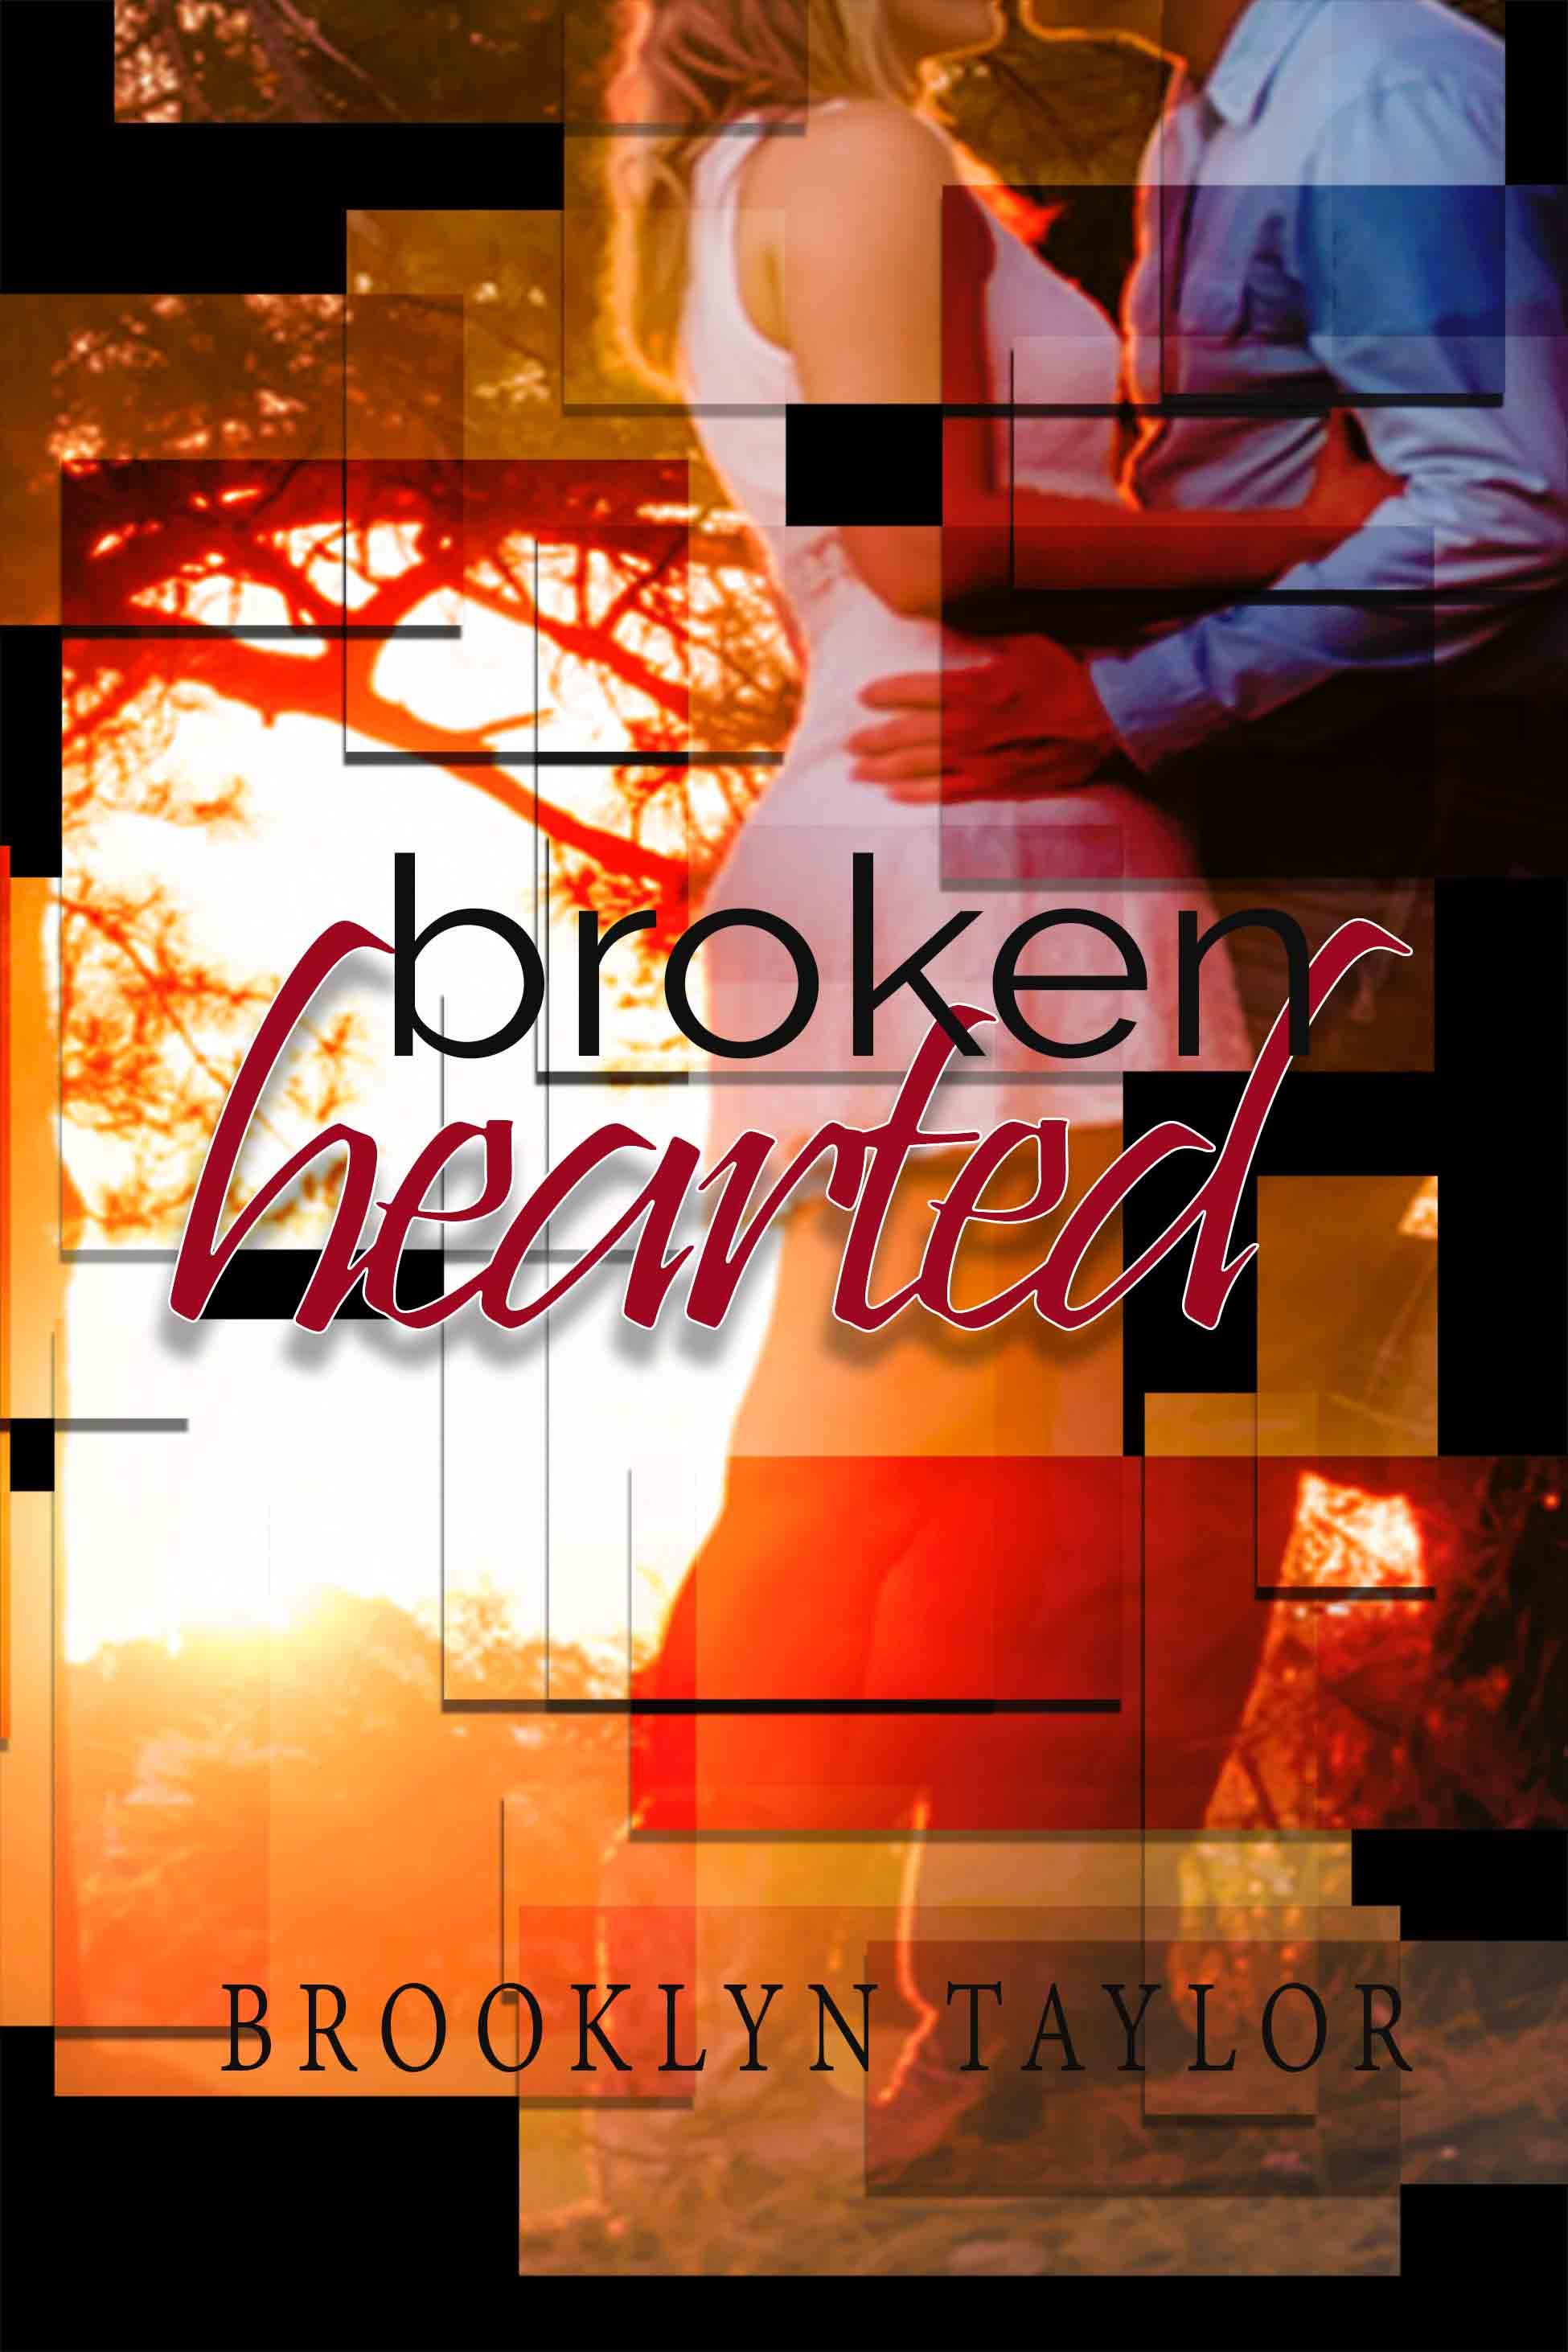 BrokenHearted by Brooklyn Taylor